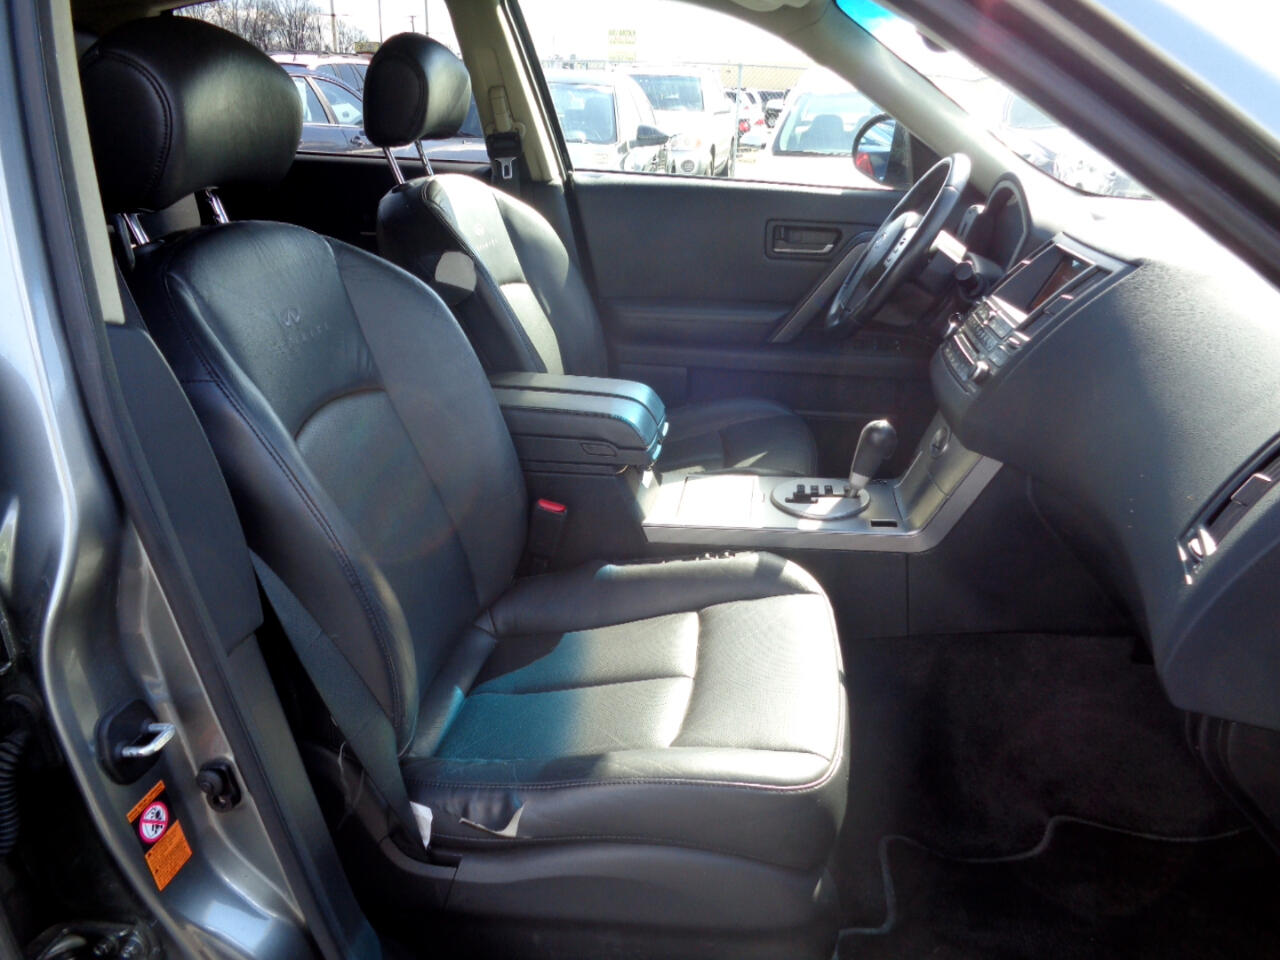 2005 Infiniti FX FX35 AWD